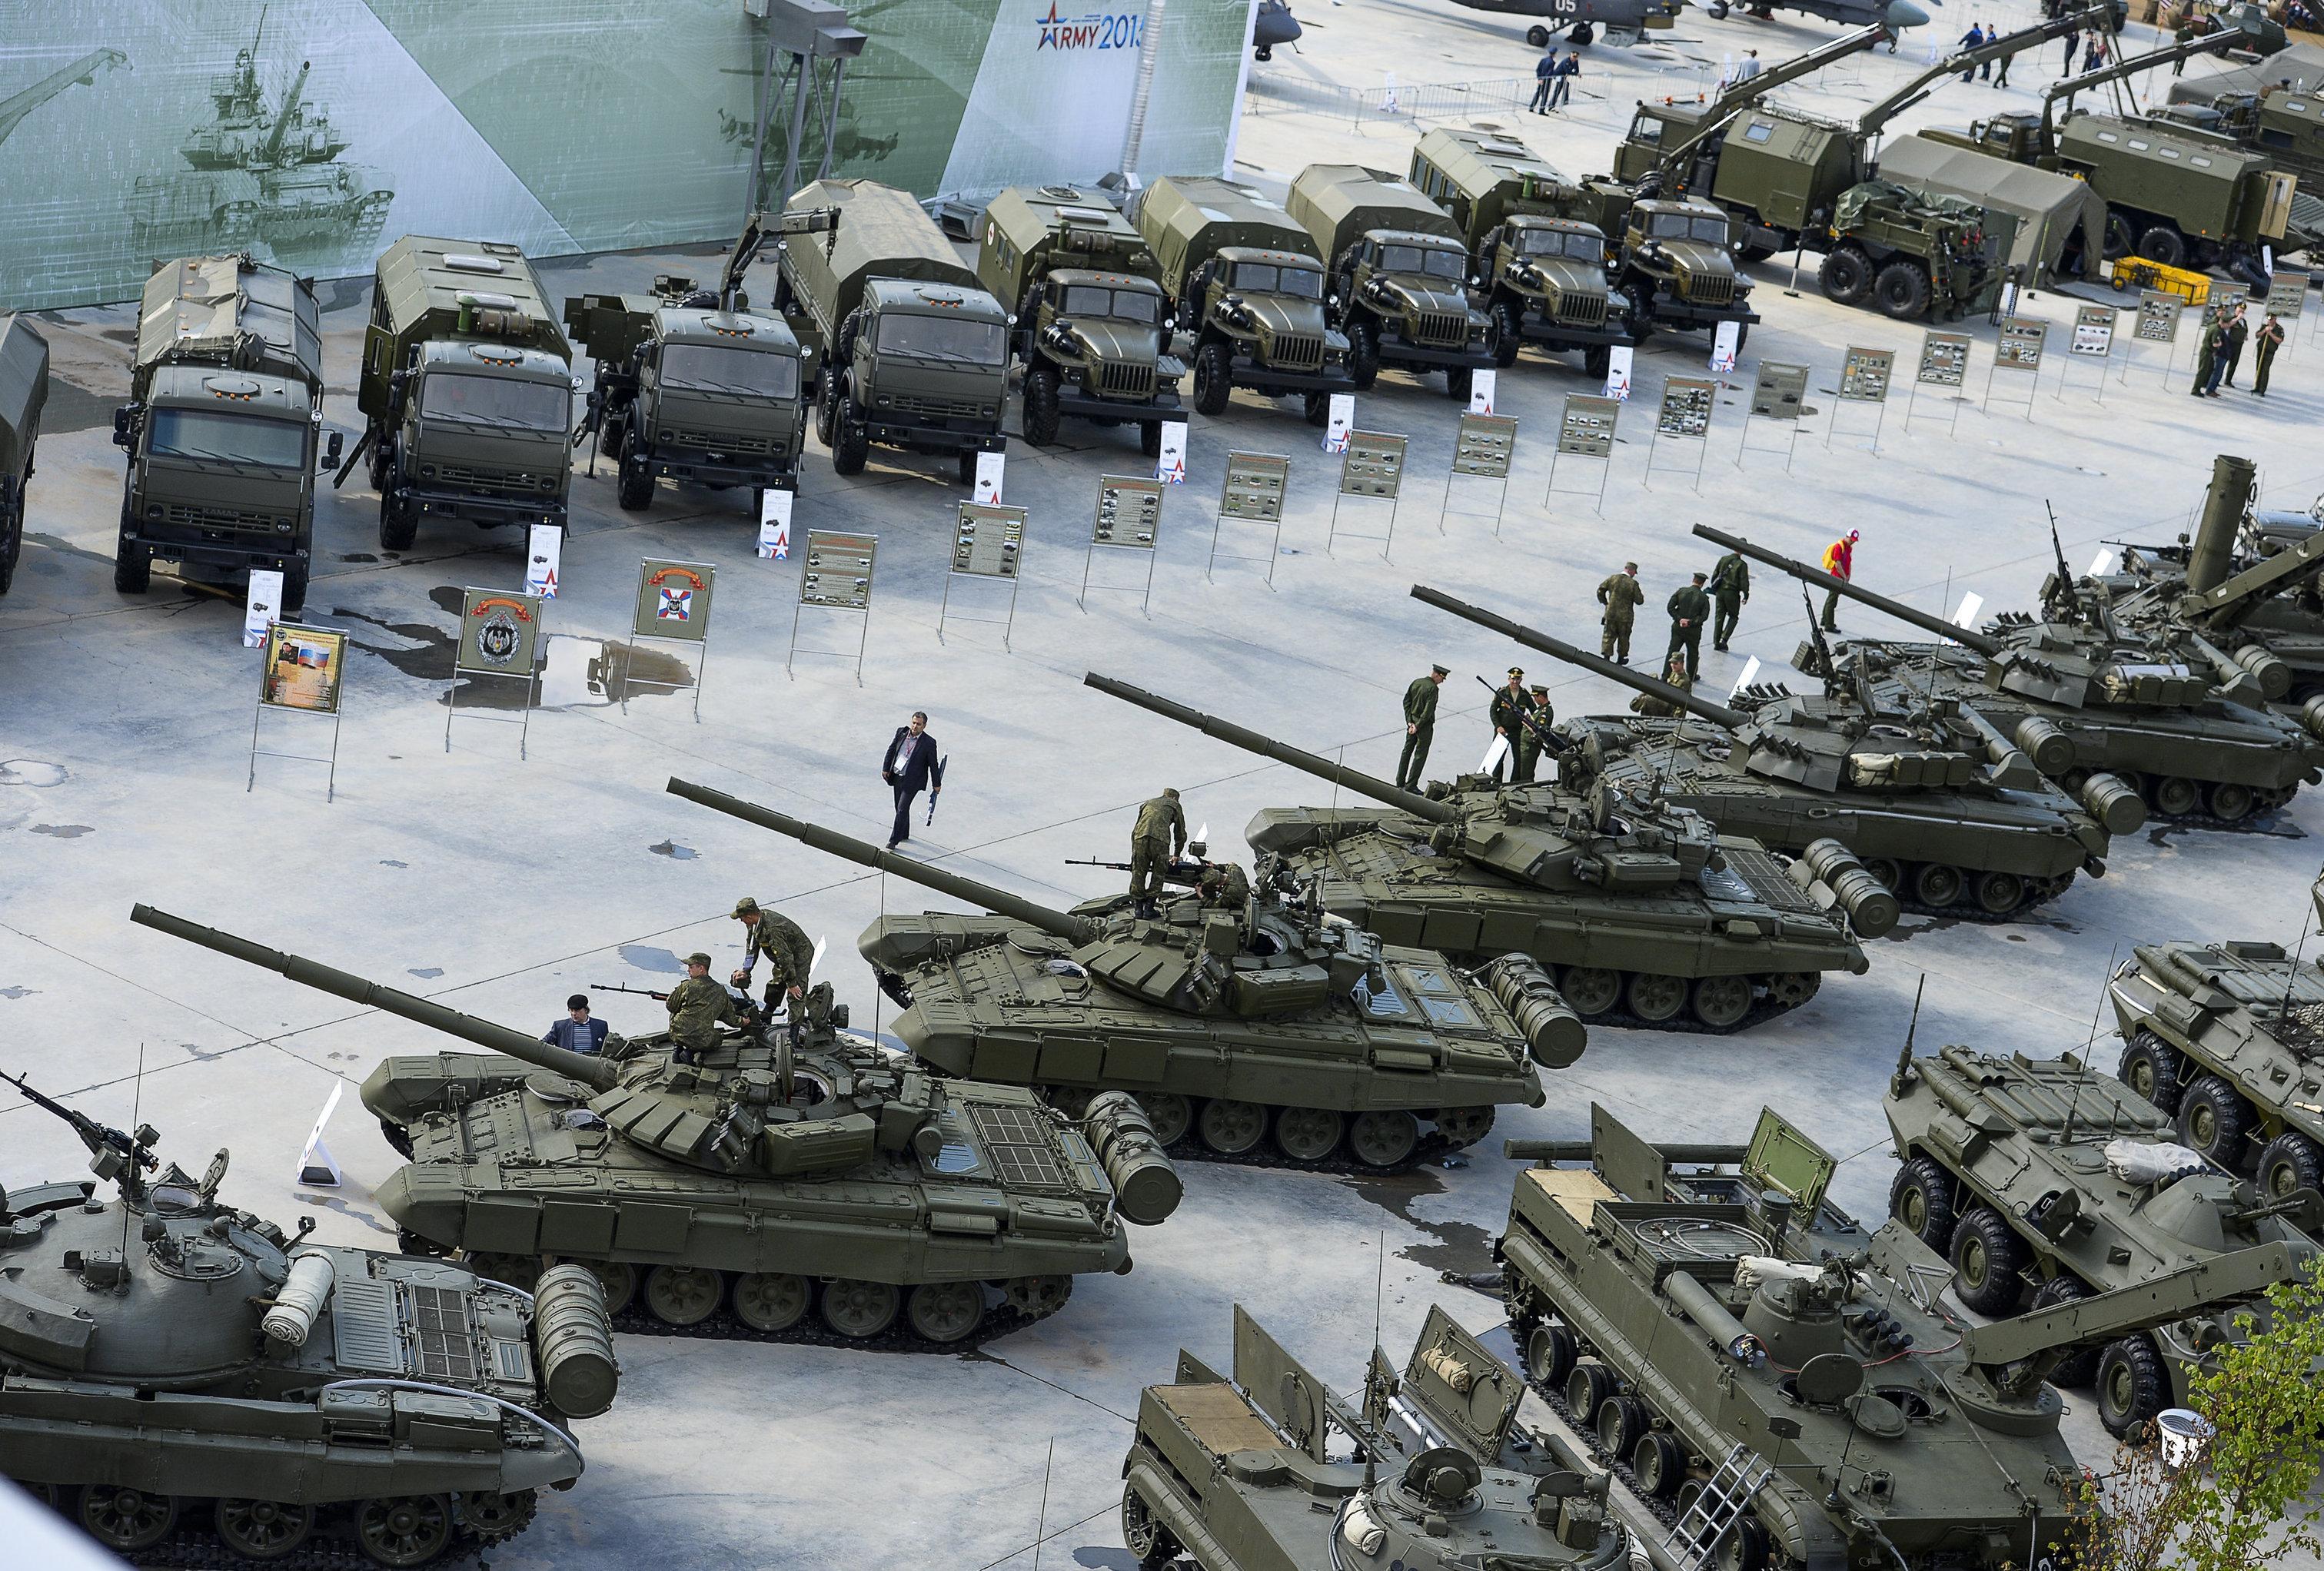 Tanques Т-72B3 en el foro internacional militar Army